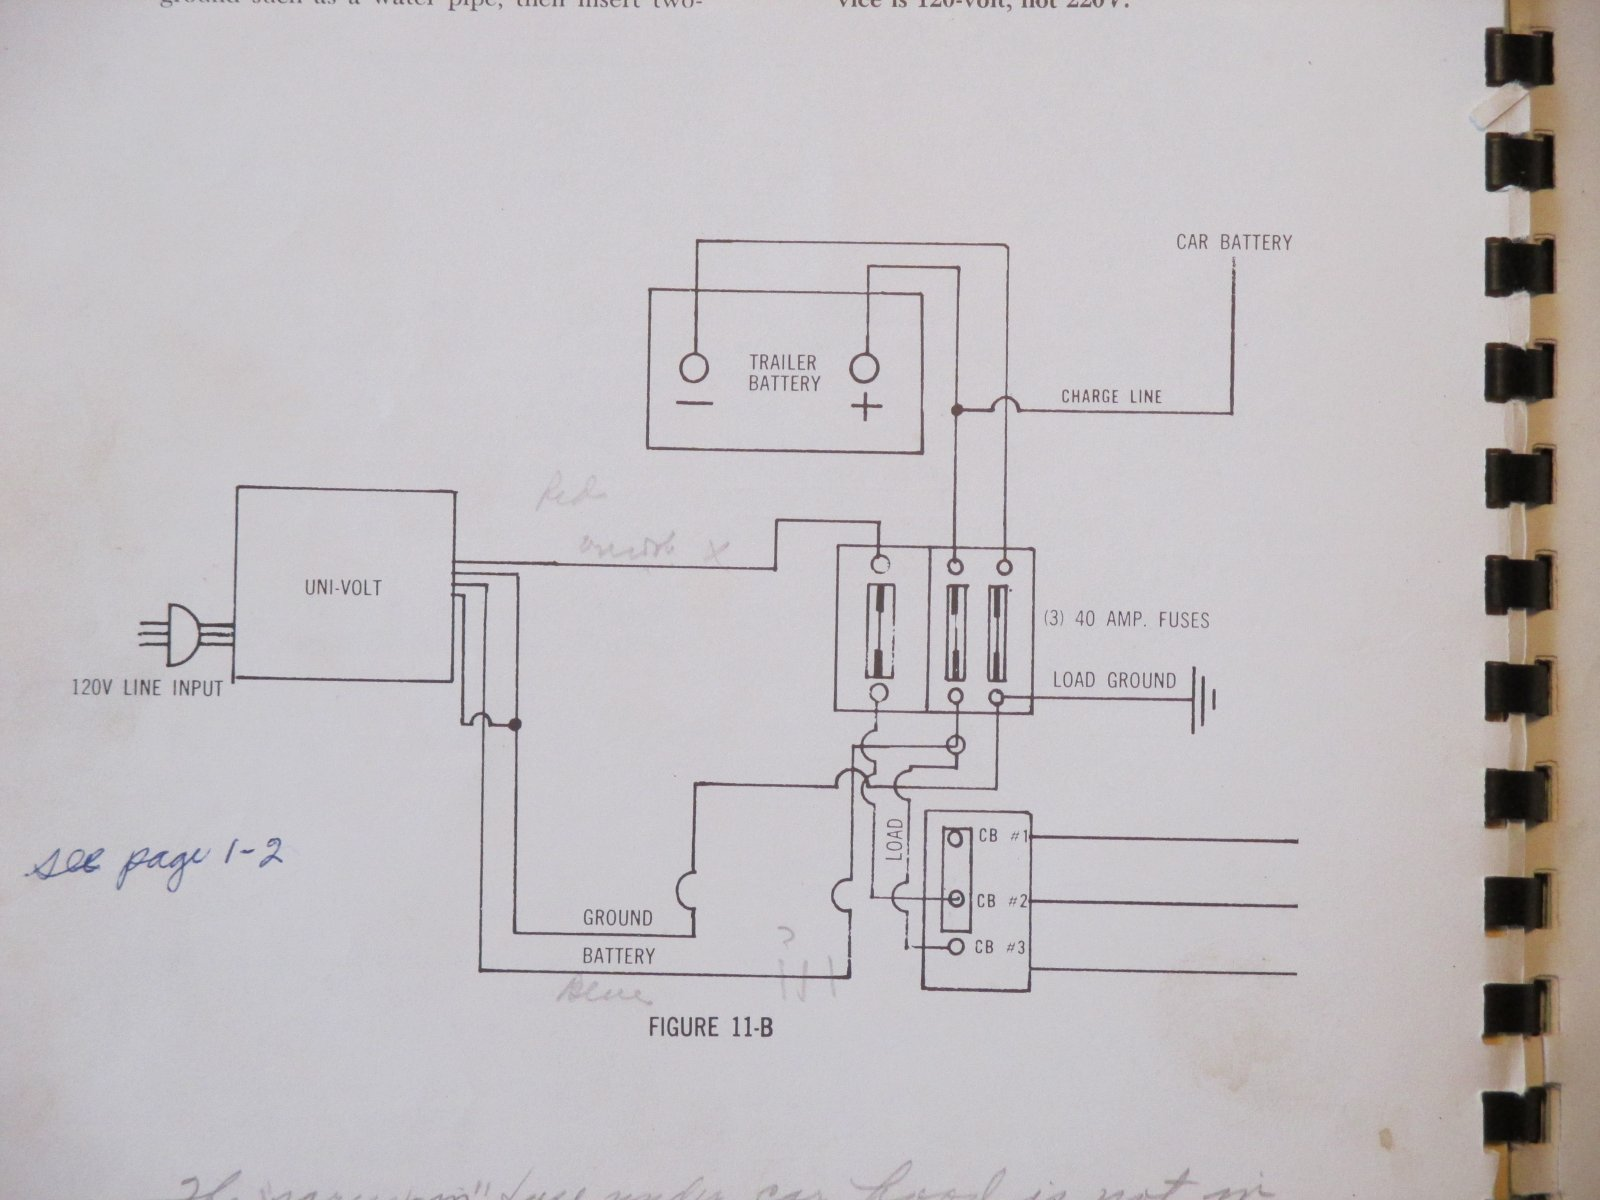 Click image for larger version  Name:1404 Univolt Wiring Diagram.jpg Views:89 Size:180.7 KB ID:226579